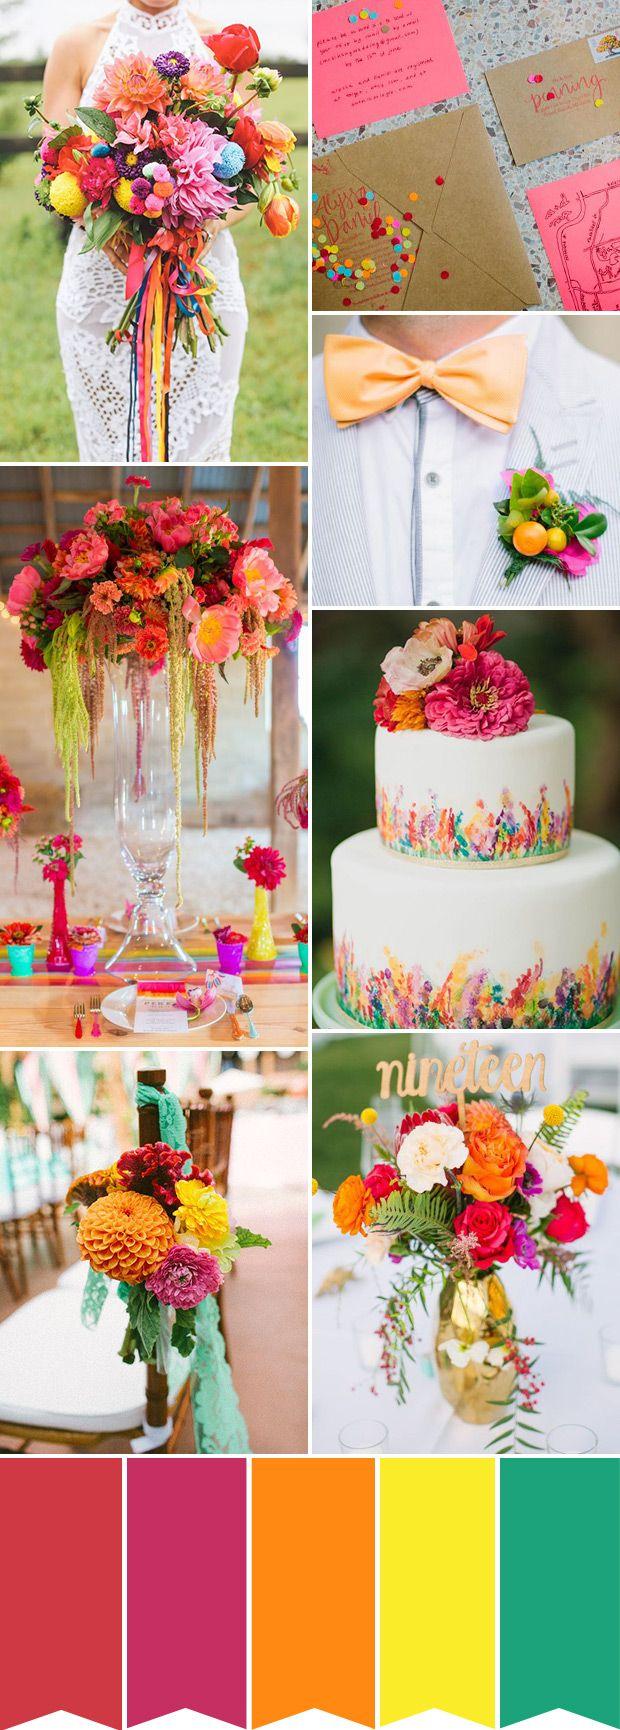 Simple Ideas to Create a Colourful Wedding  Summer wedding